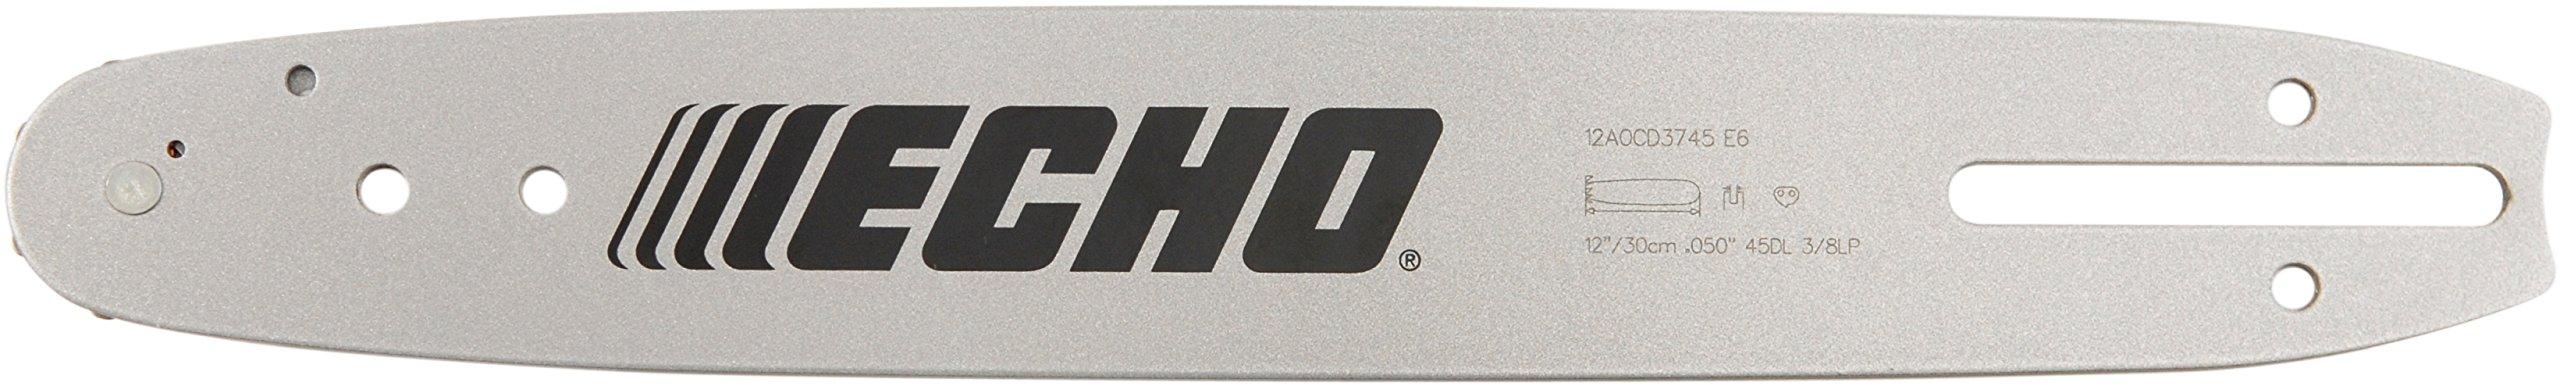 Echo 12A0CD3745C 12'' Guide Bar